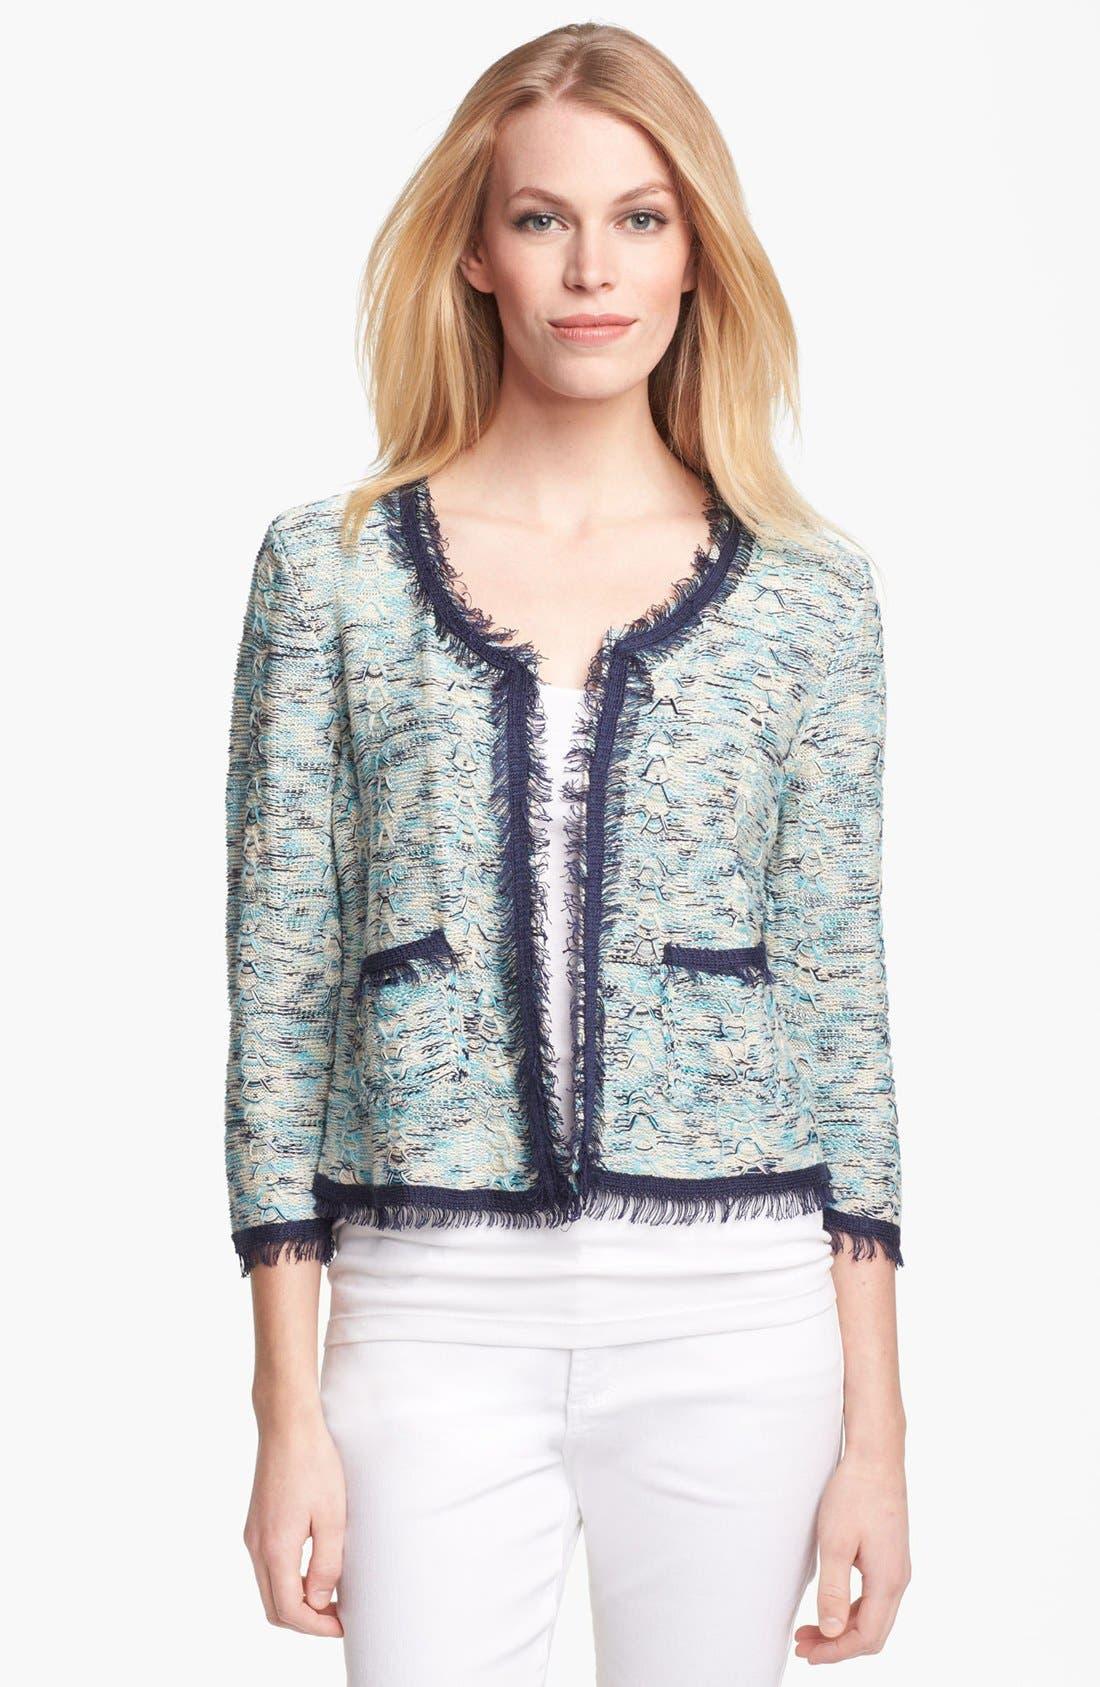 Alternate Image 1 Selected - Nic + Zoe Tweed Knit Jacket (Petite)